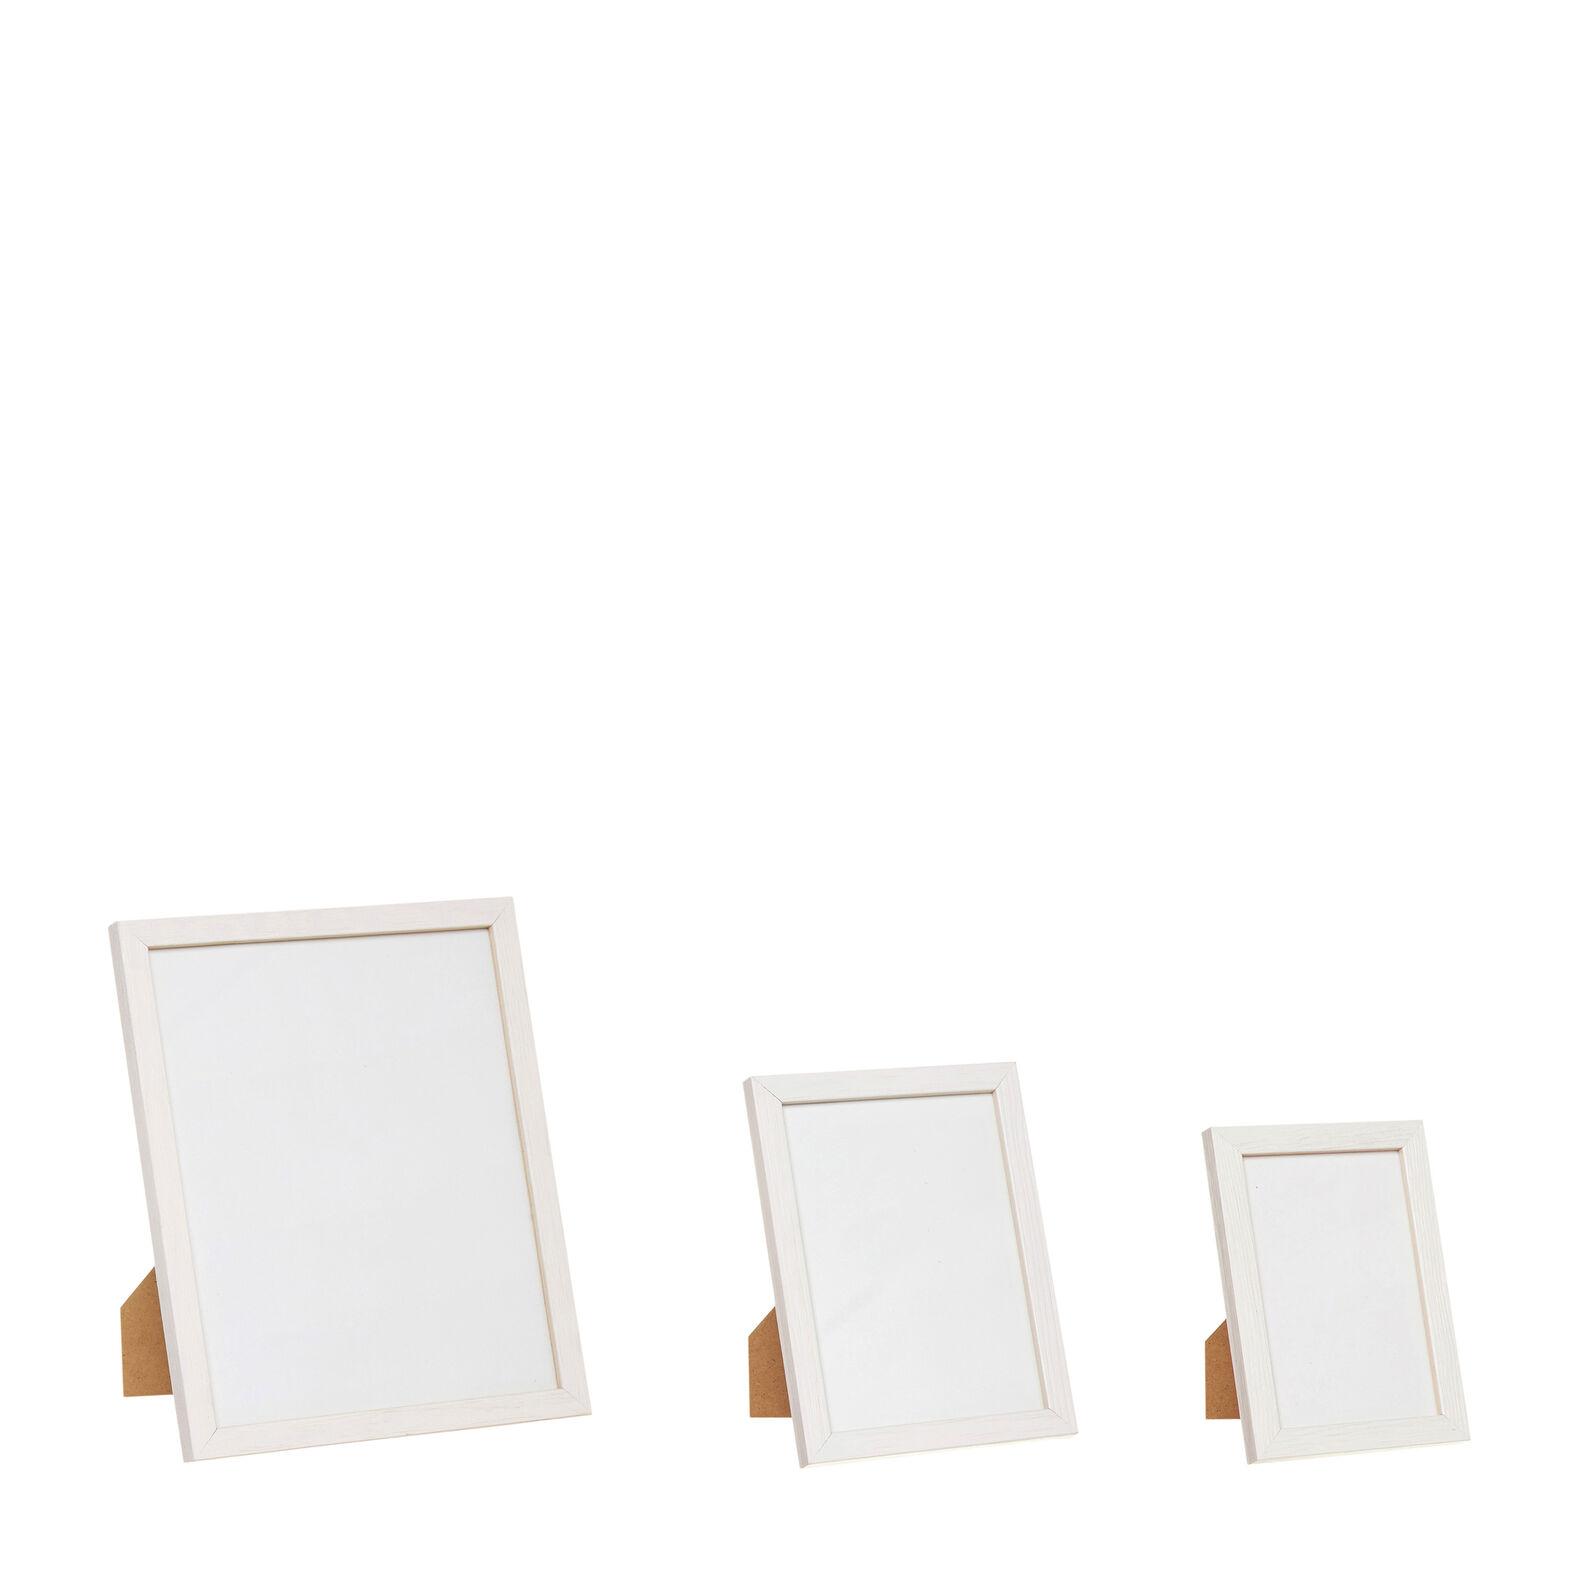 White wood photo frame